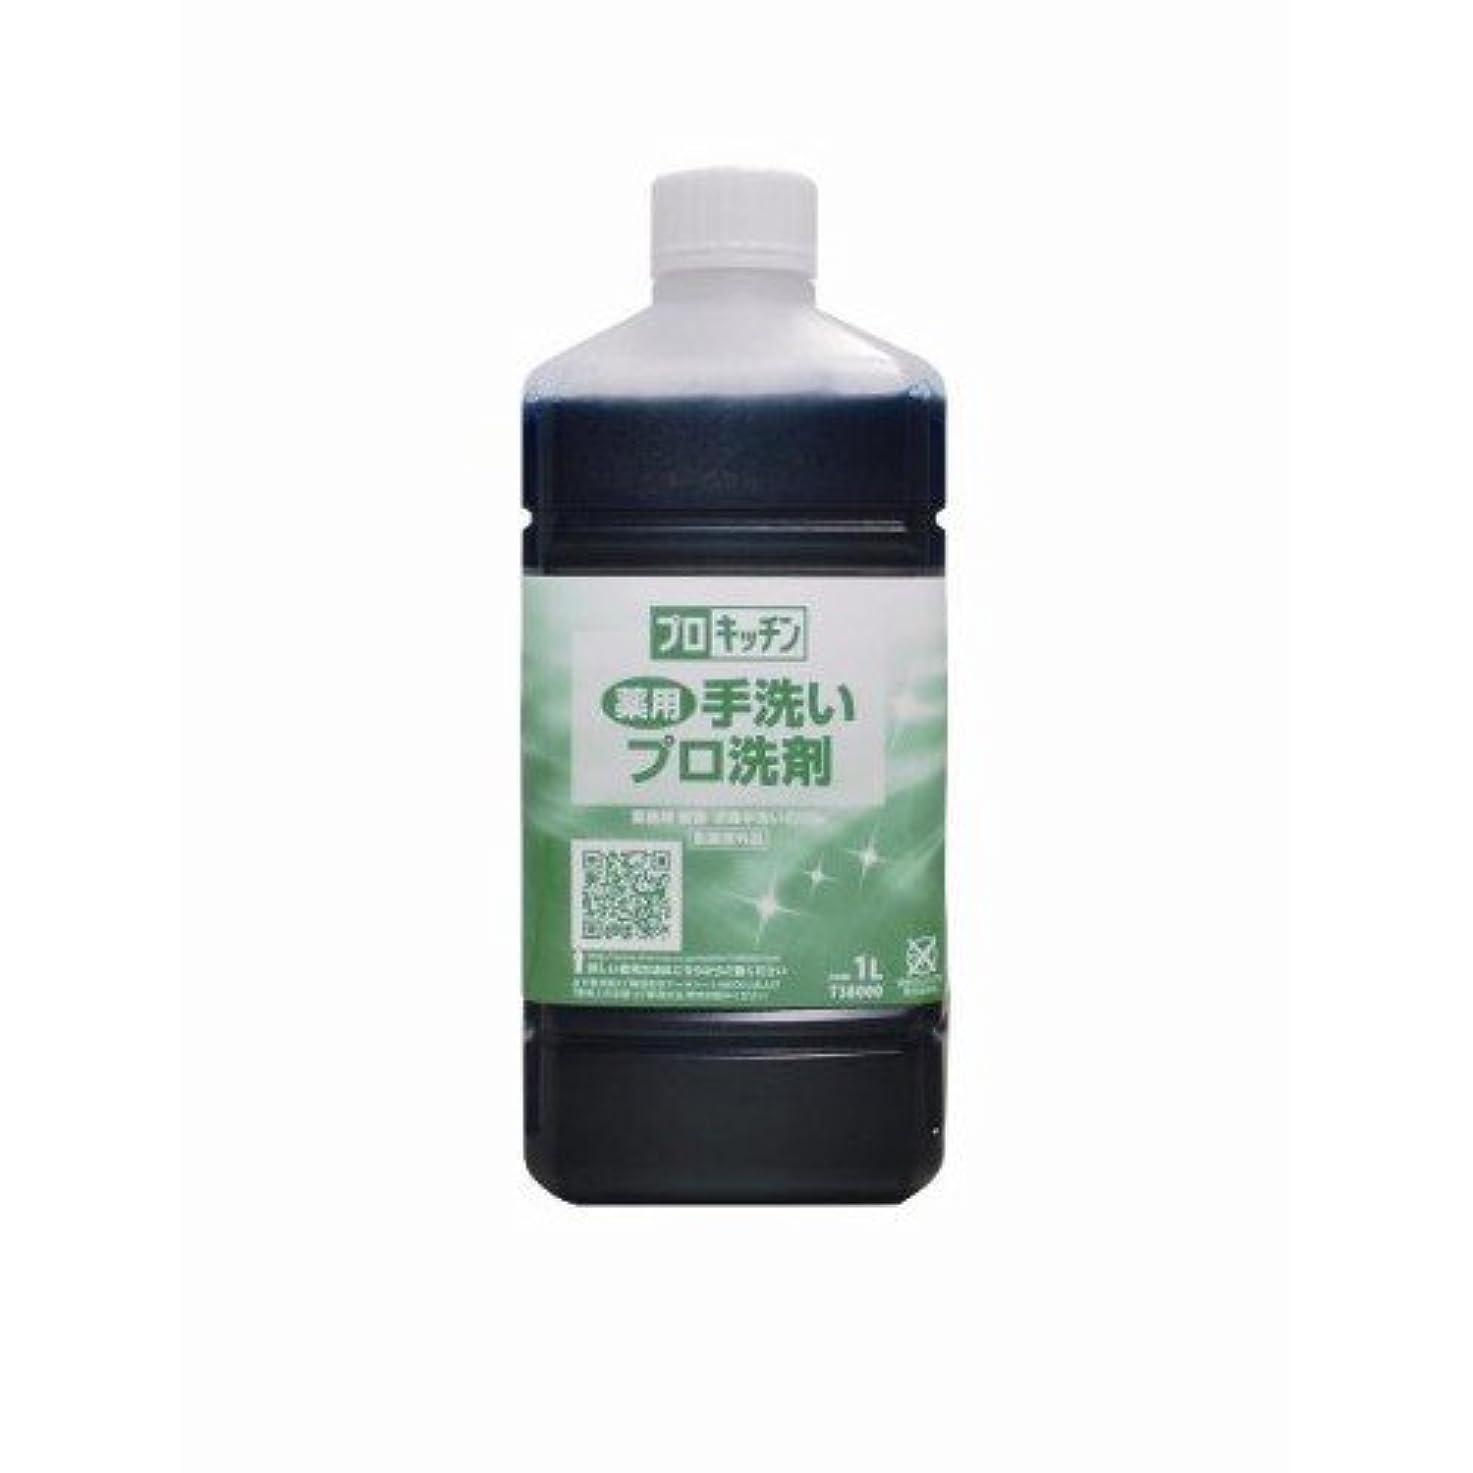 楽観頭蓋骨家具薬用手洗いプロ洗剤 1L